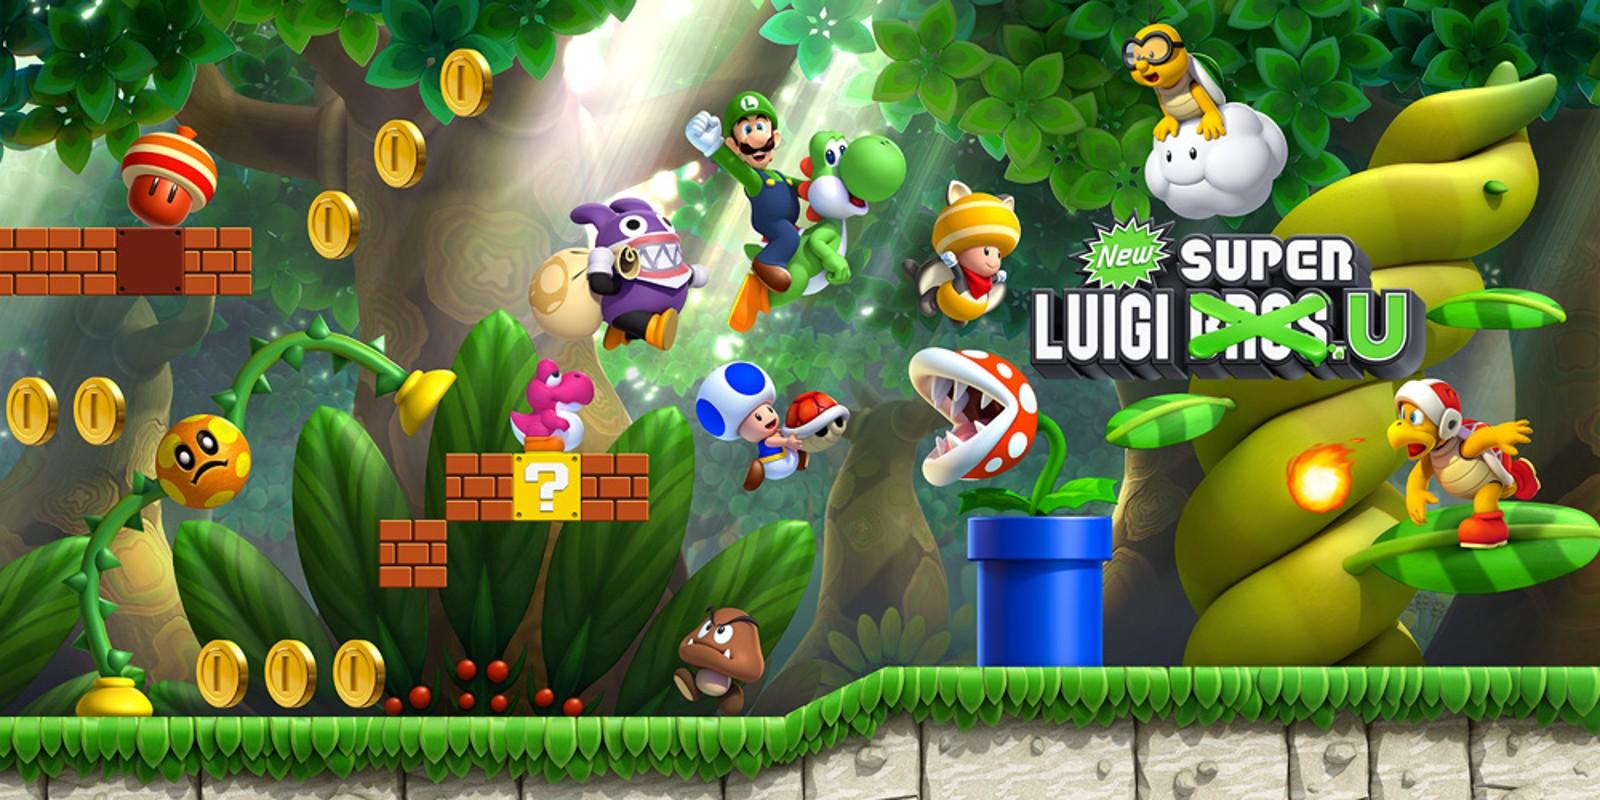 Super Metroid Hd Wallpaper New Super Luigi U Wii U Games Nintendo